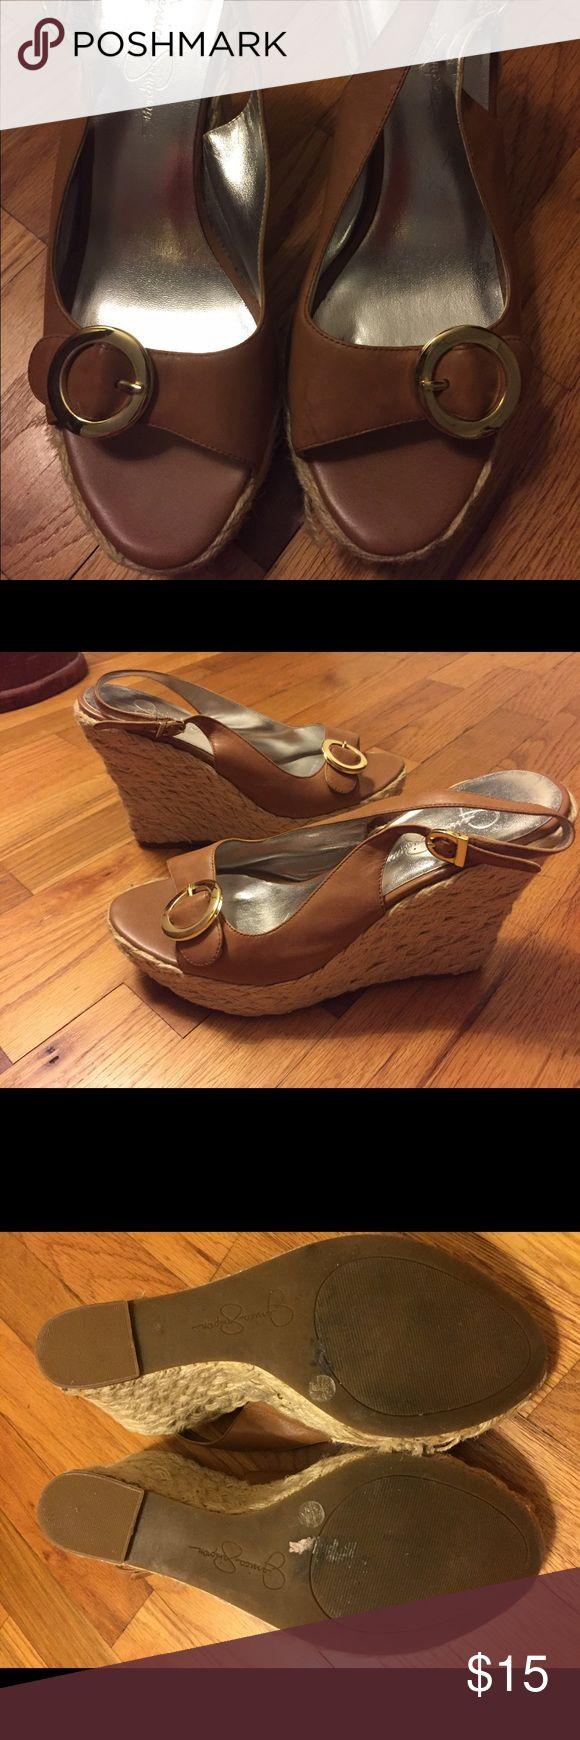 Jessica Simpson Wedge Shoes Jessica Simpson Wedge Shoes worn once Jessica Simpson Shoes Wedges